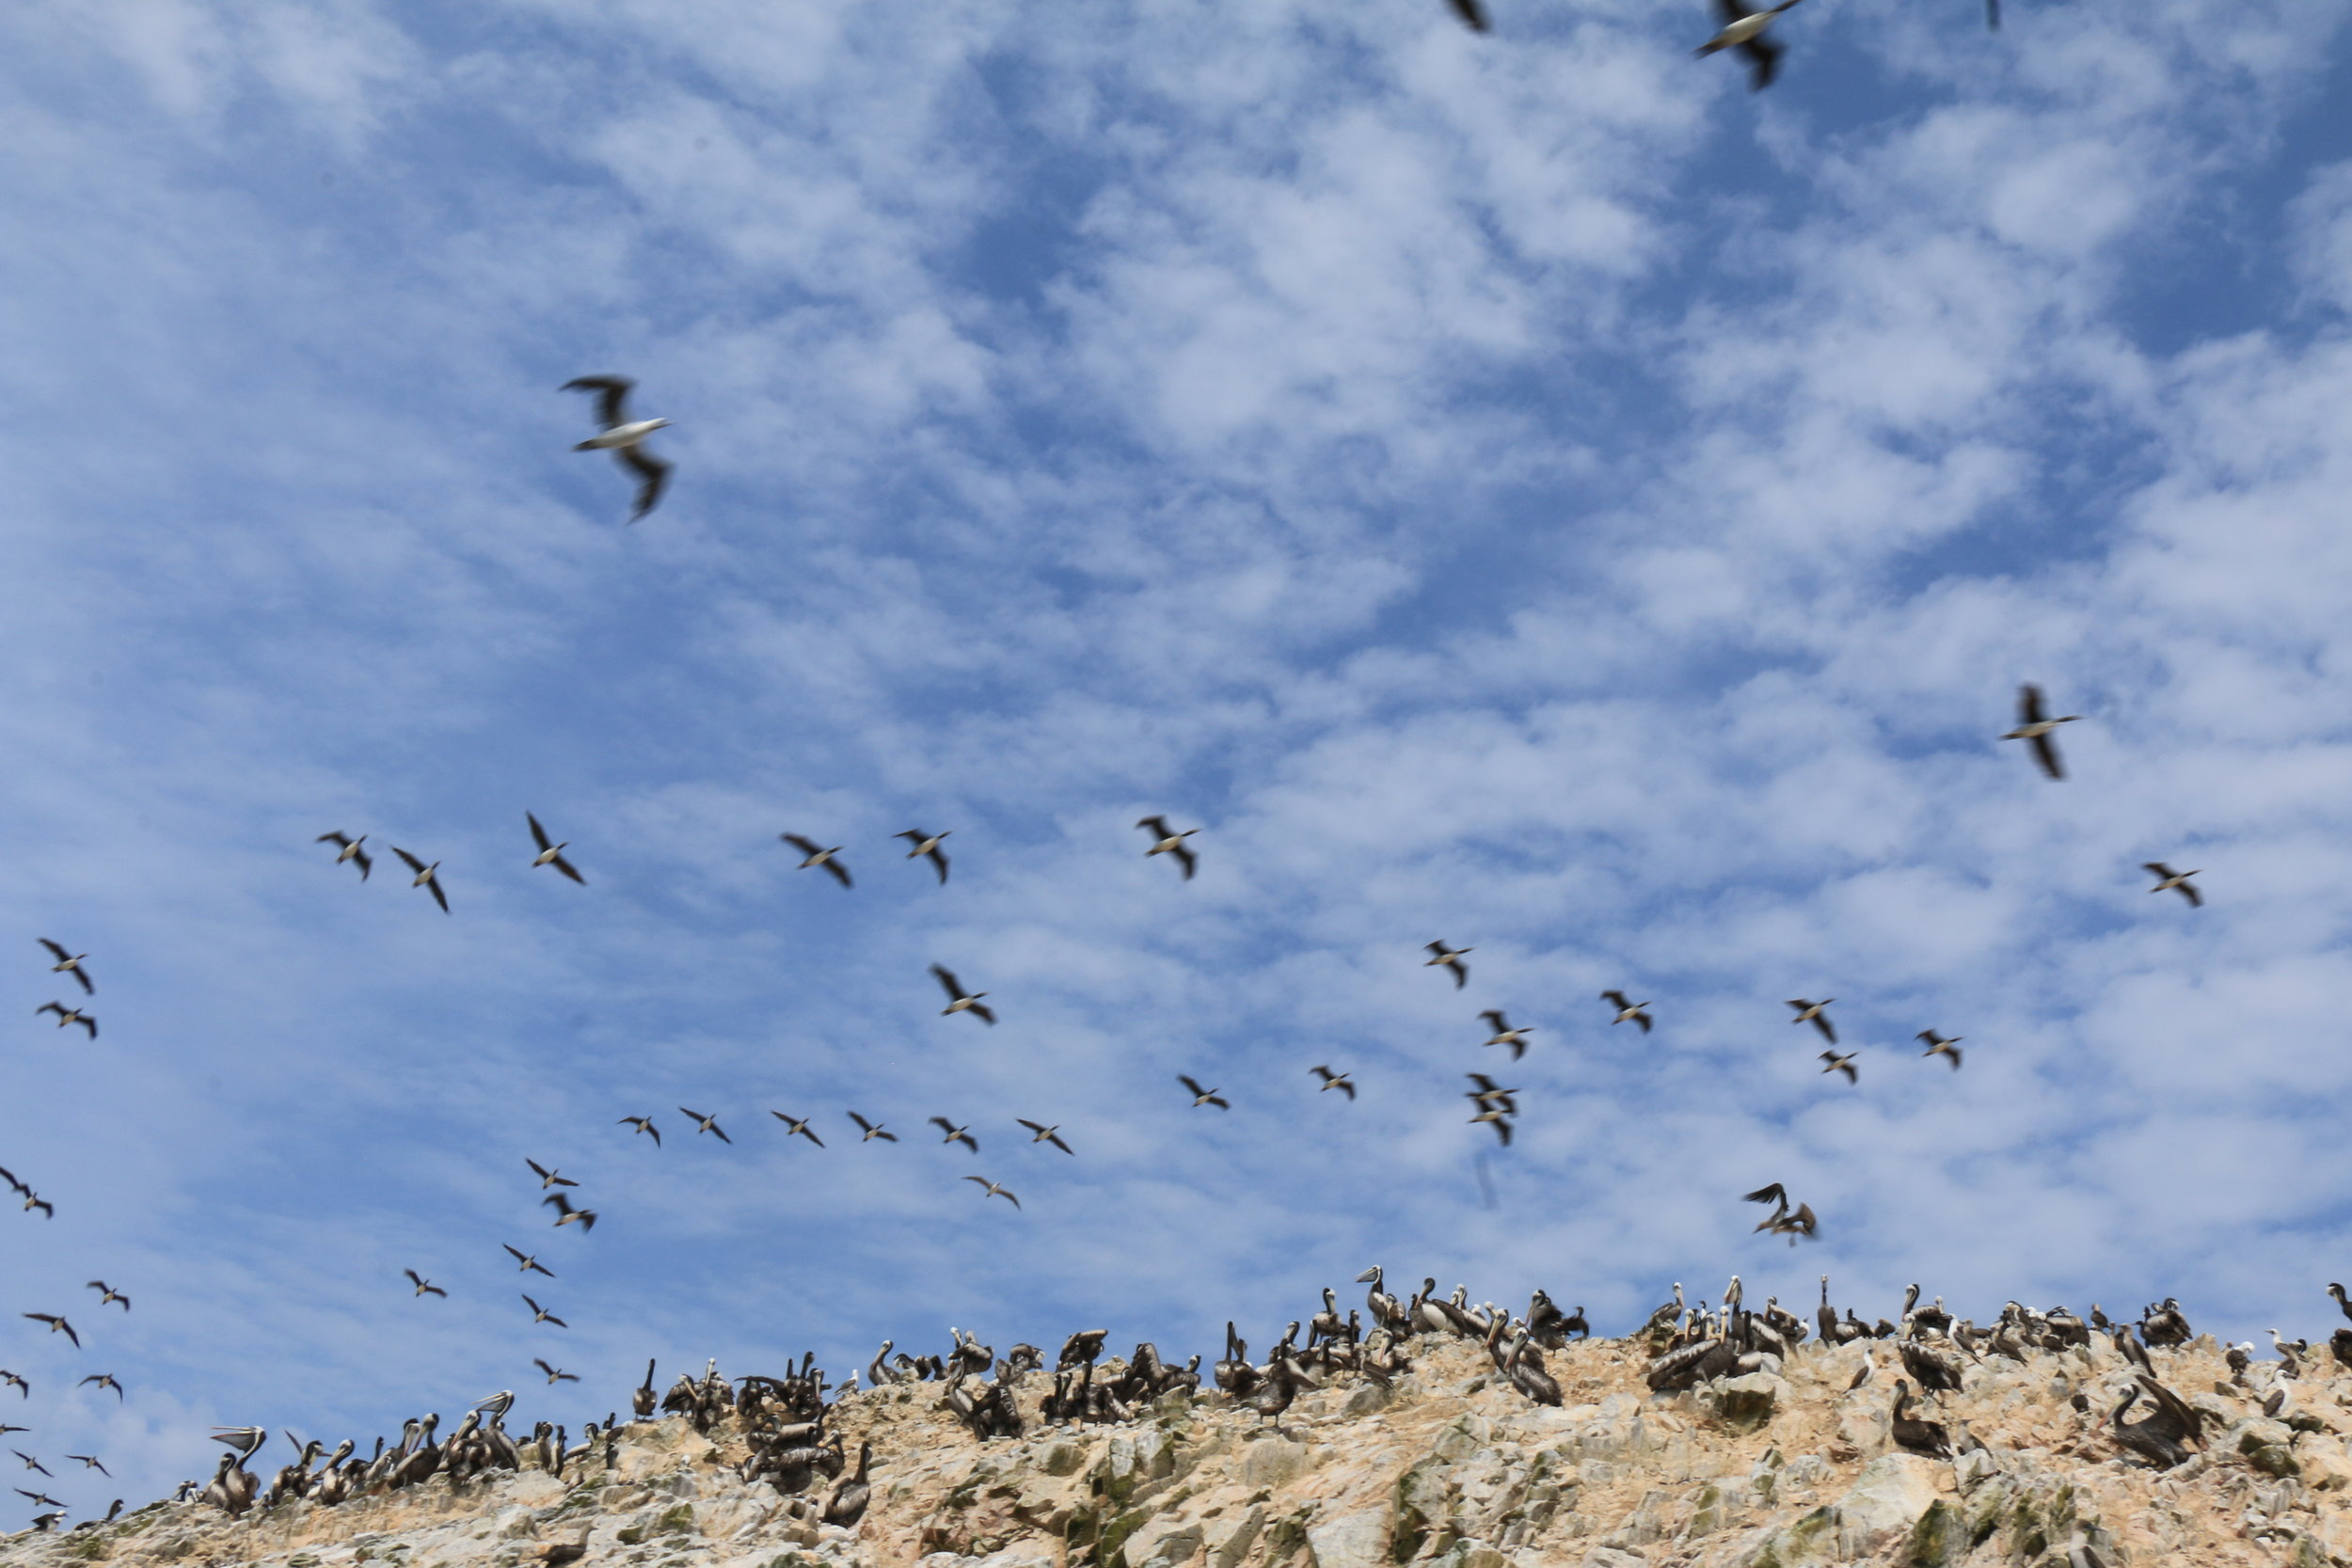 1.28 - WS, Paracas, Birds.jpeg